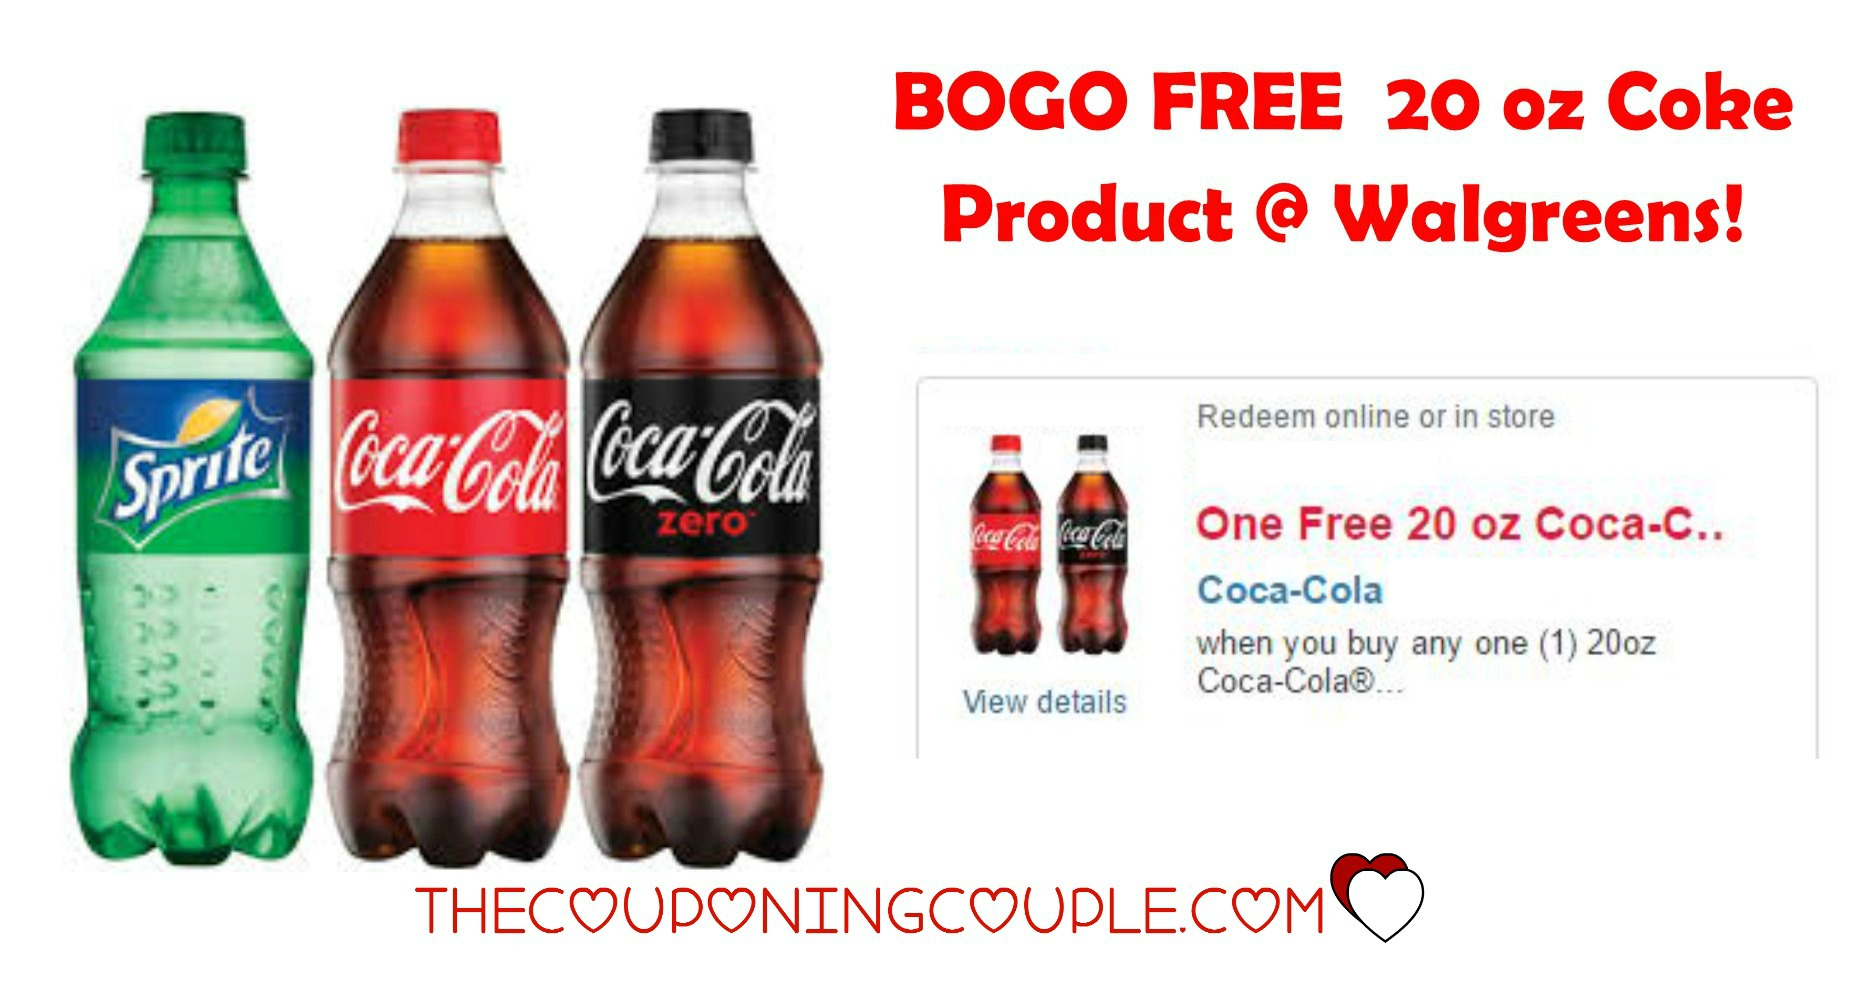 Bogo Free 20 Oz Coke Ecoupon @ Walgreens! Through 8/3! - Free Printable Coupons For Coca Cola Products